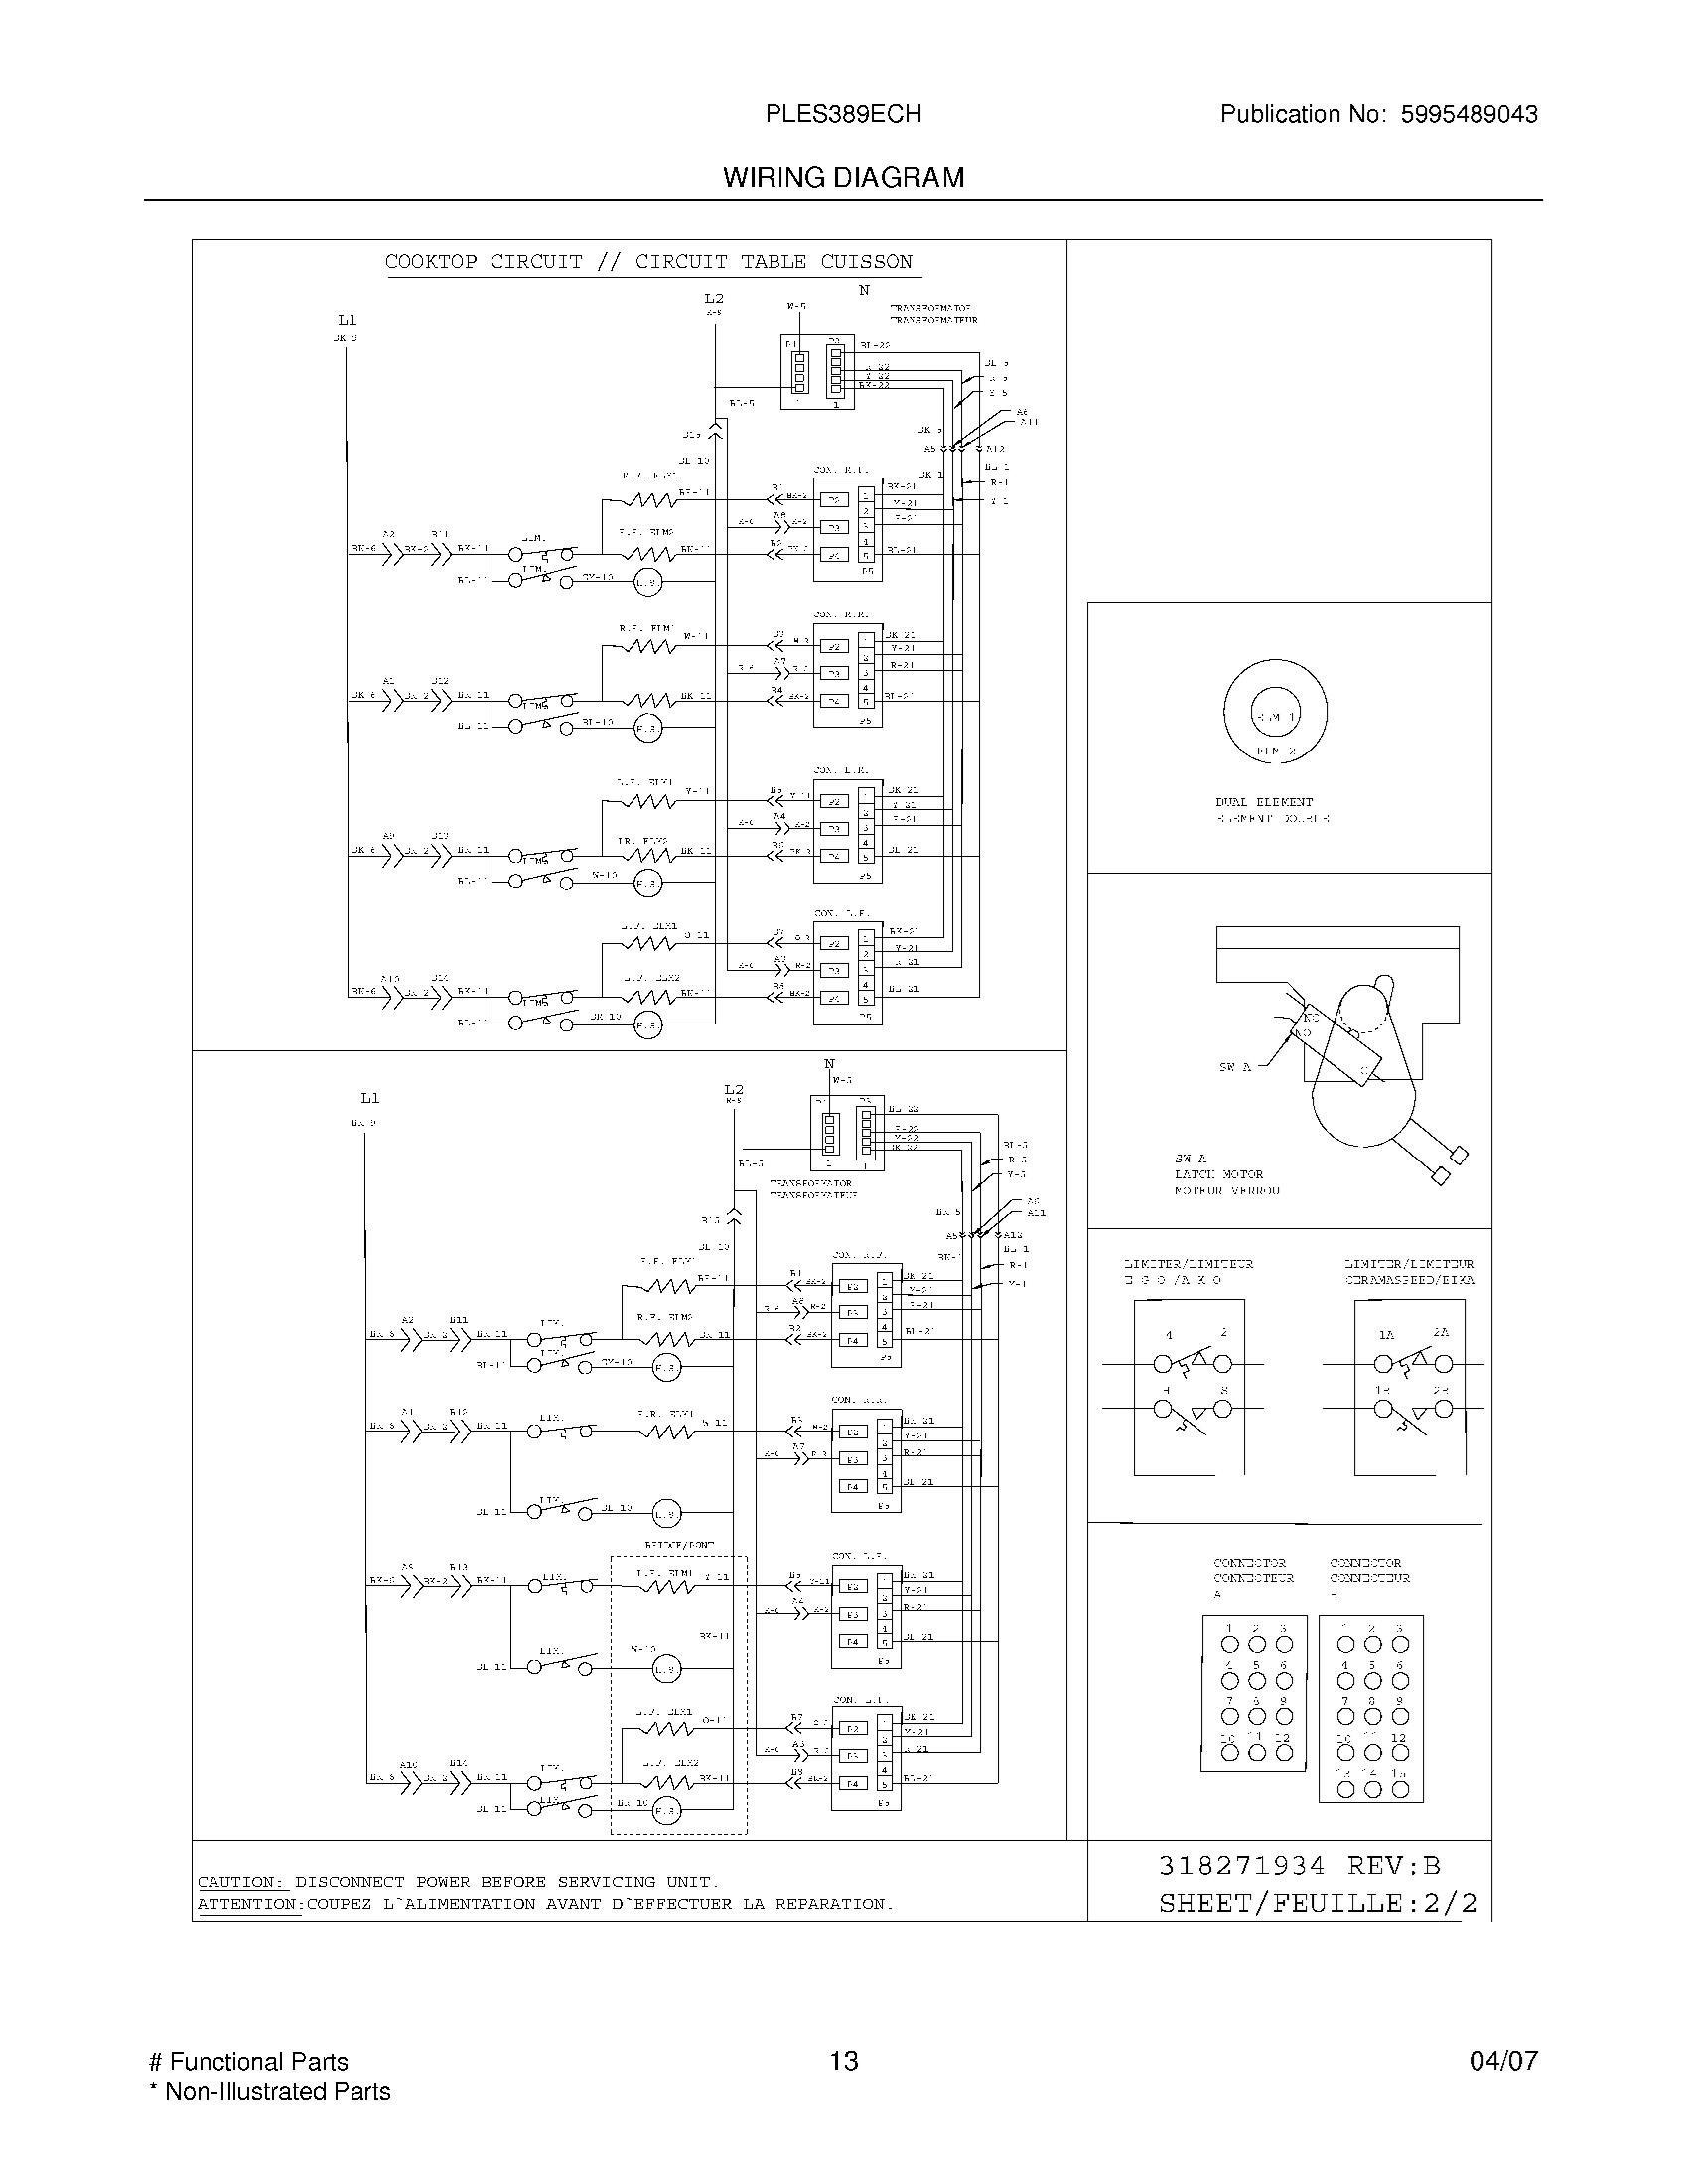 ElectroluxImg_19000101 20150717_00146085?width=1000 ples389ech frigidaire company appliance parts Basic Electrical Wiring Diagrams at honlapkeszites.co